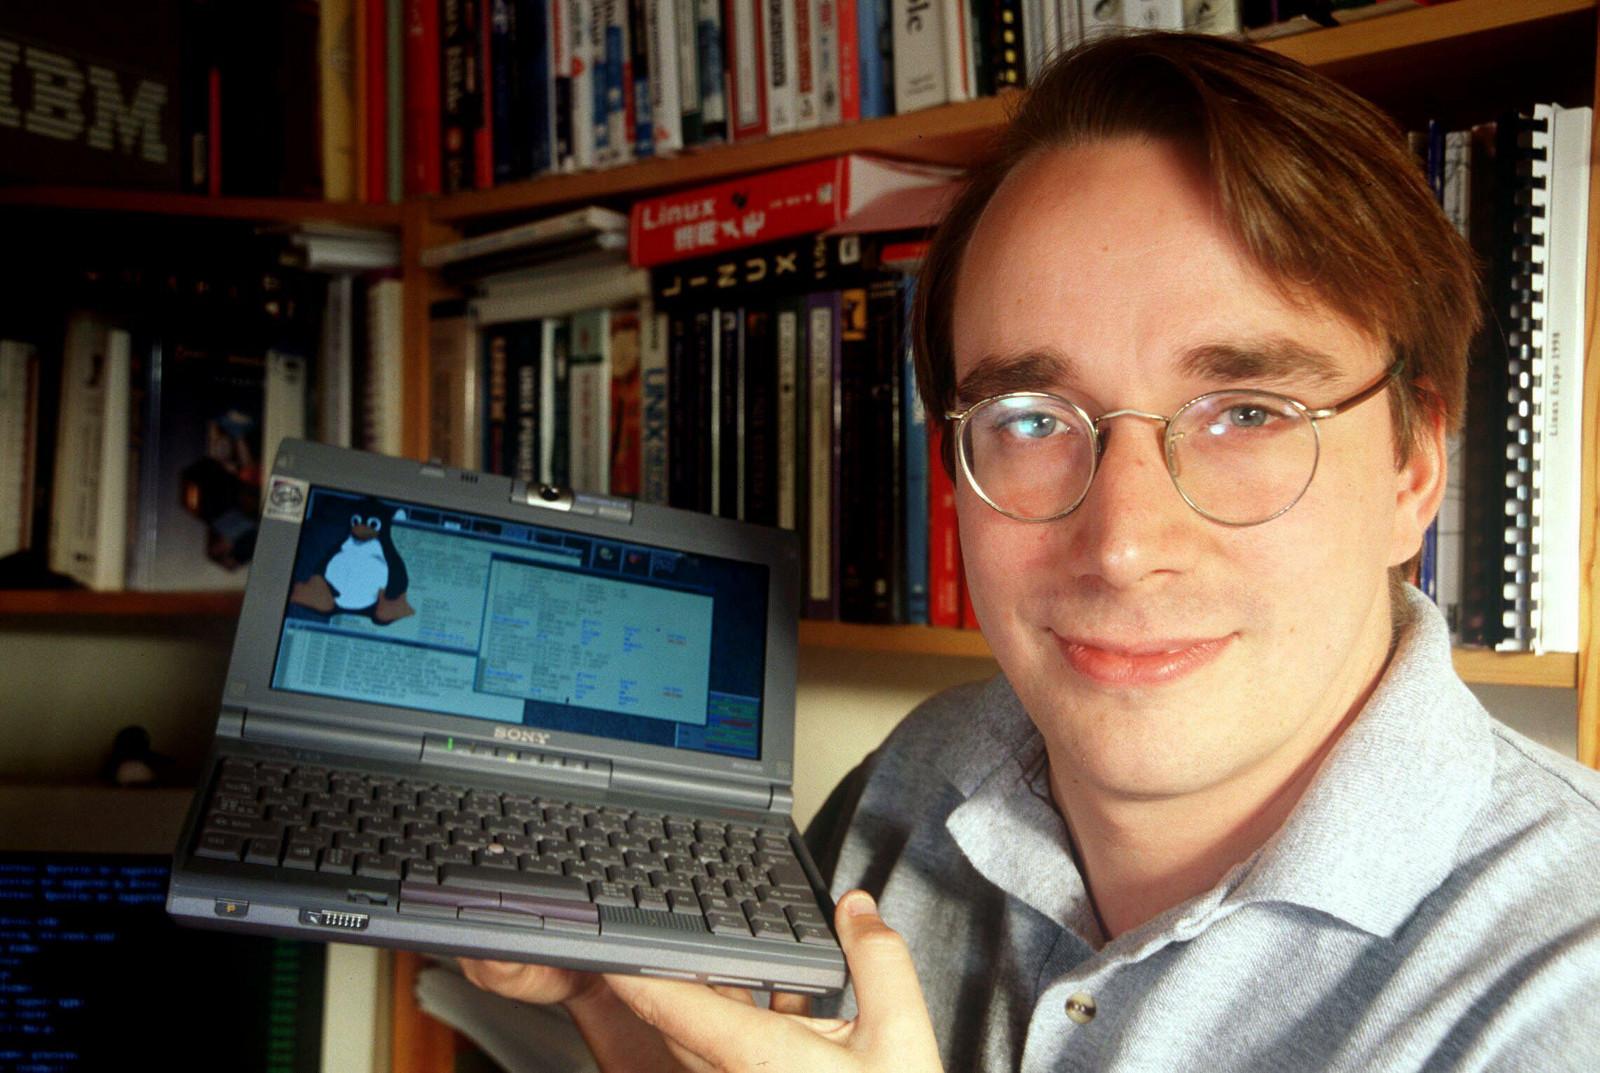 En 1992, Linus Torvalds utilizó esa GNU GPL para licenciar el Kernel Linux.